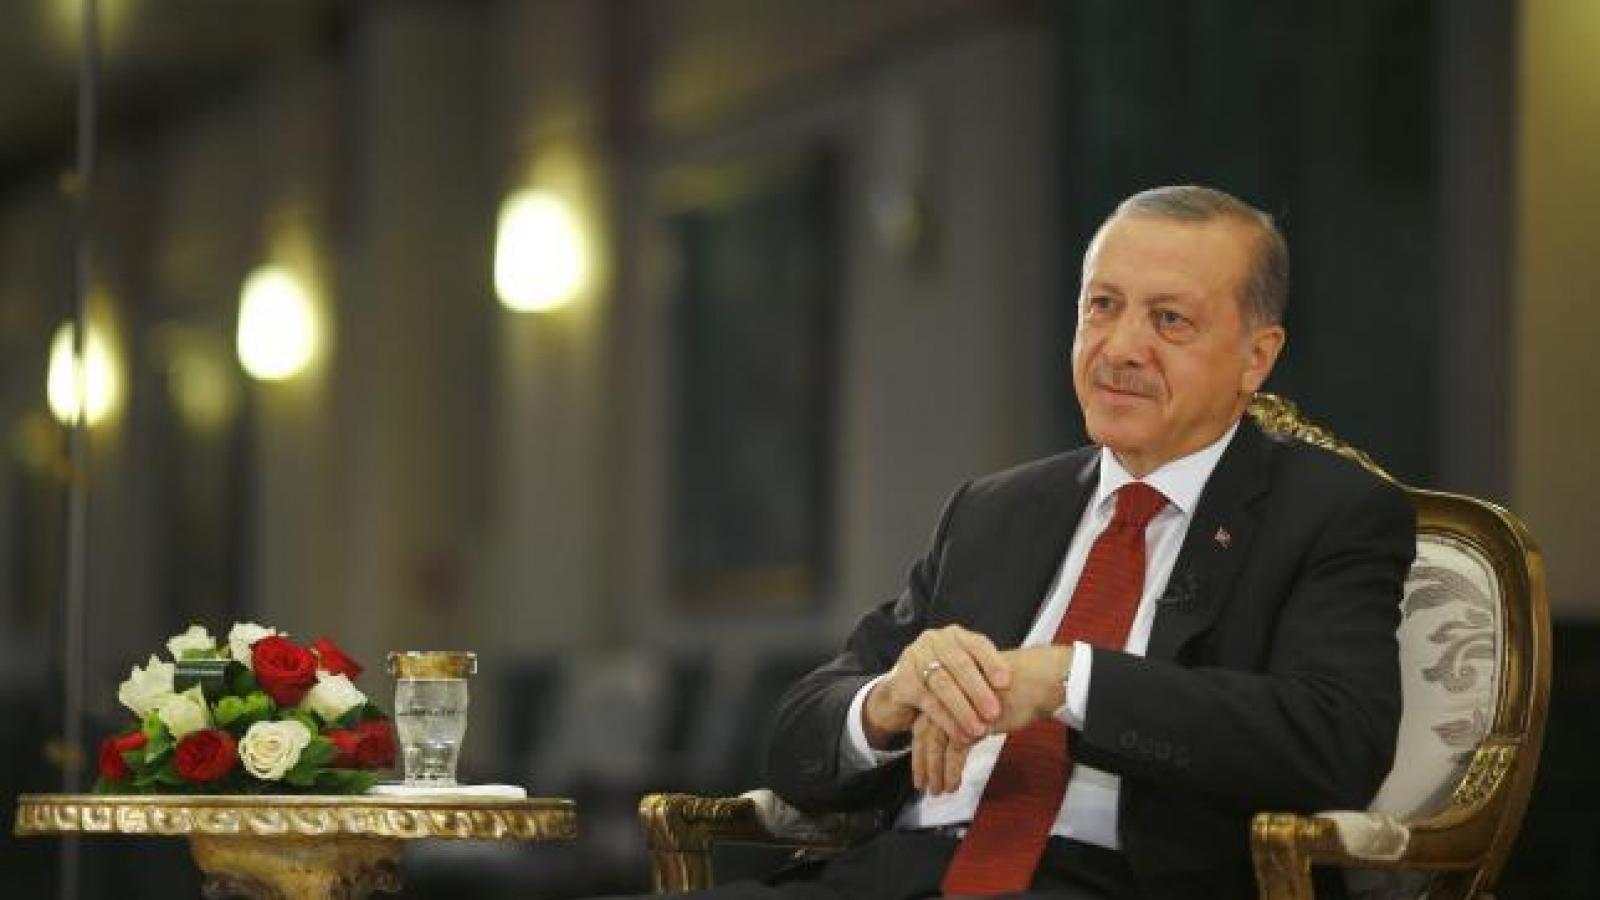 Erdogan vows military shake-up as Turkey seeks to assuage critics